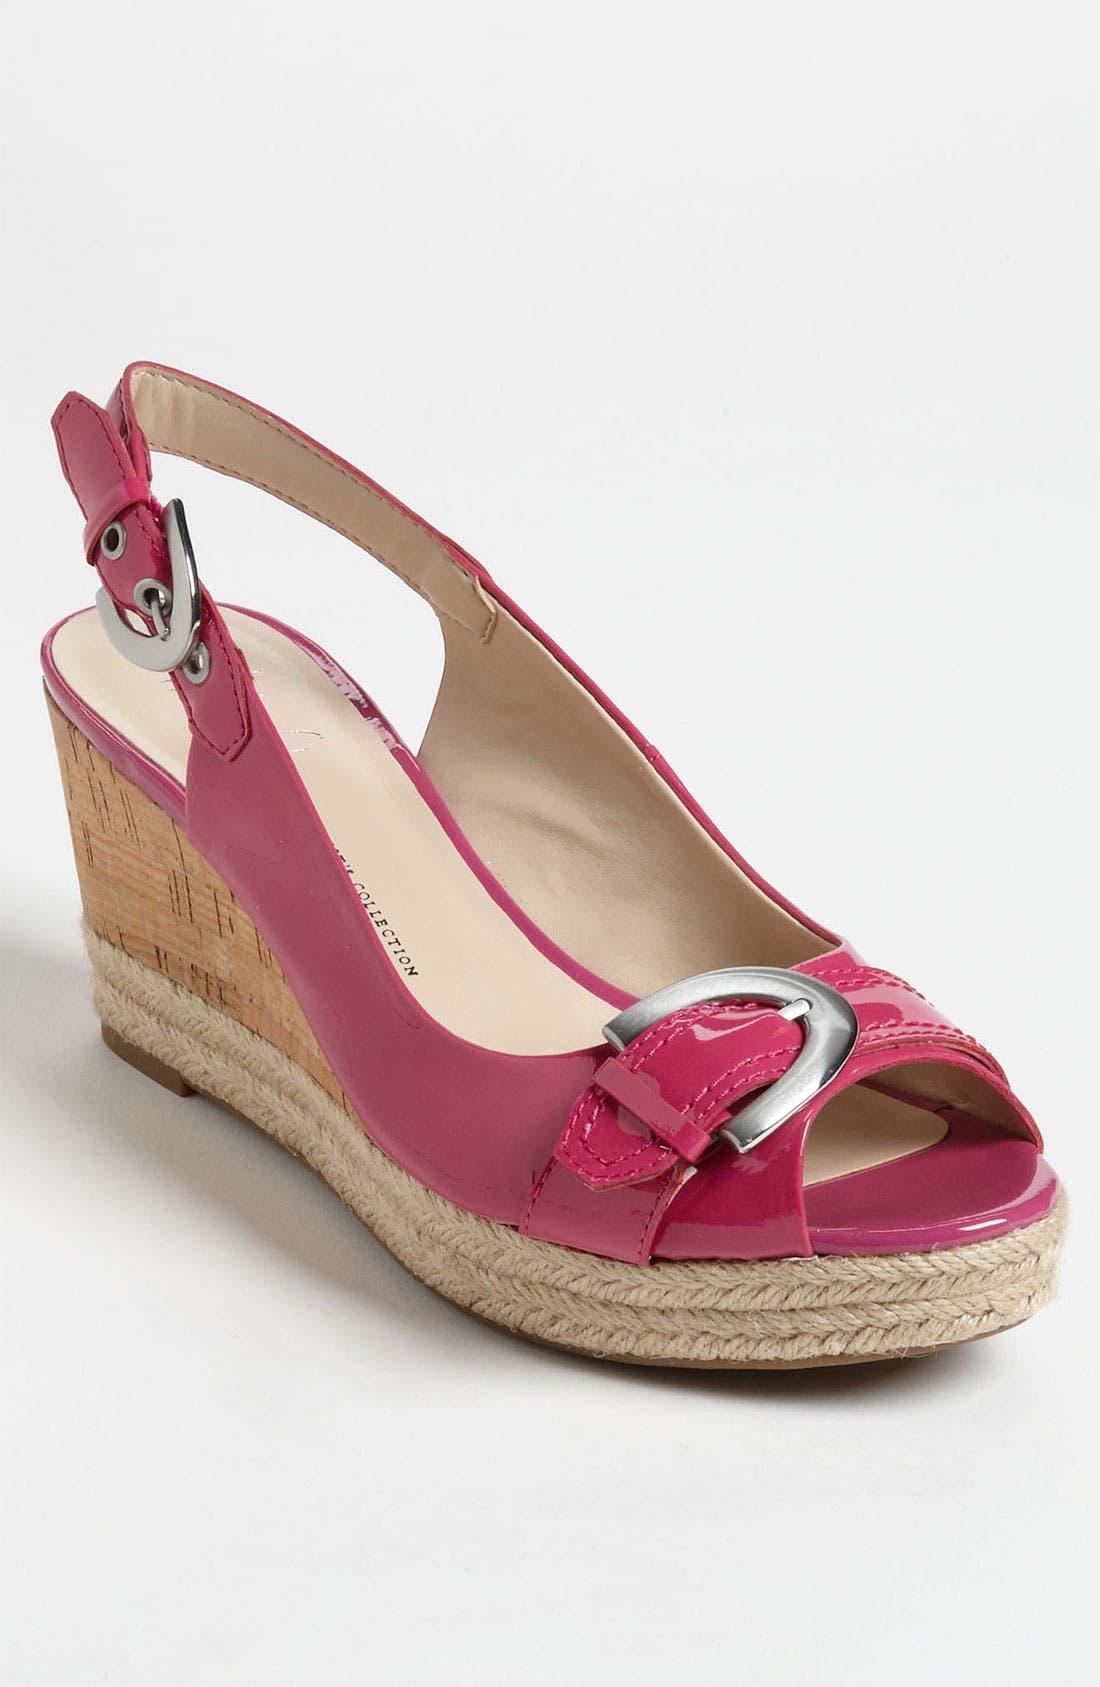 Main Image - Franco Sarto 'Kendra' Sandal (Special Purchase)